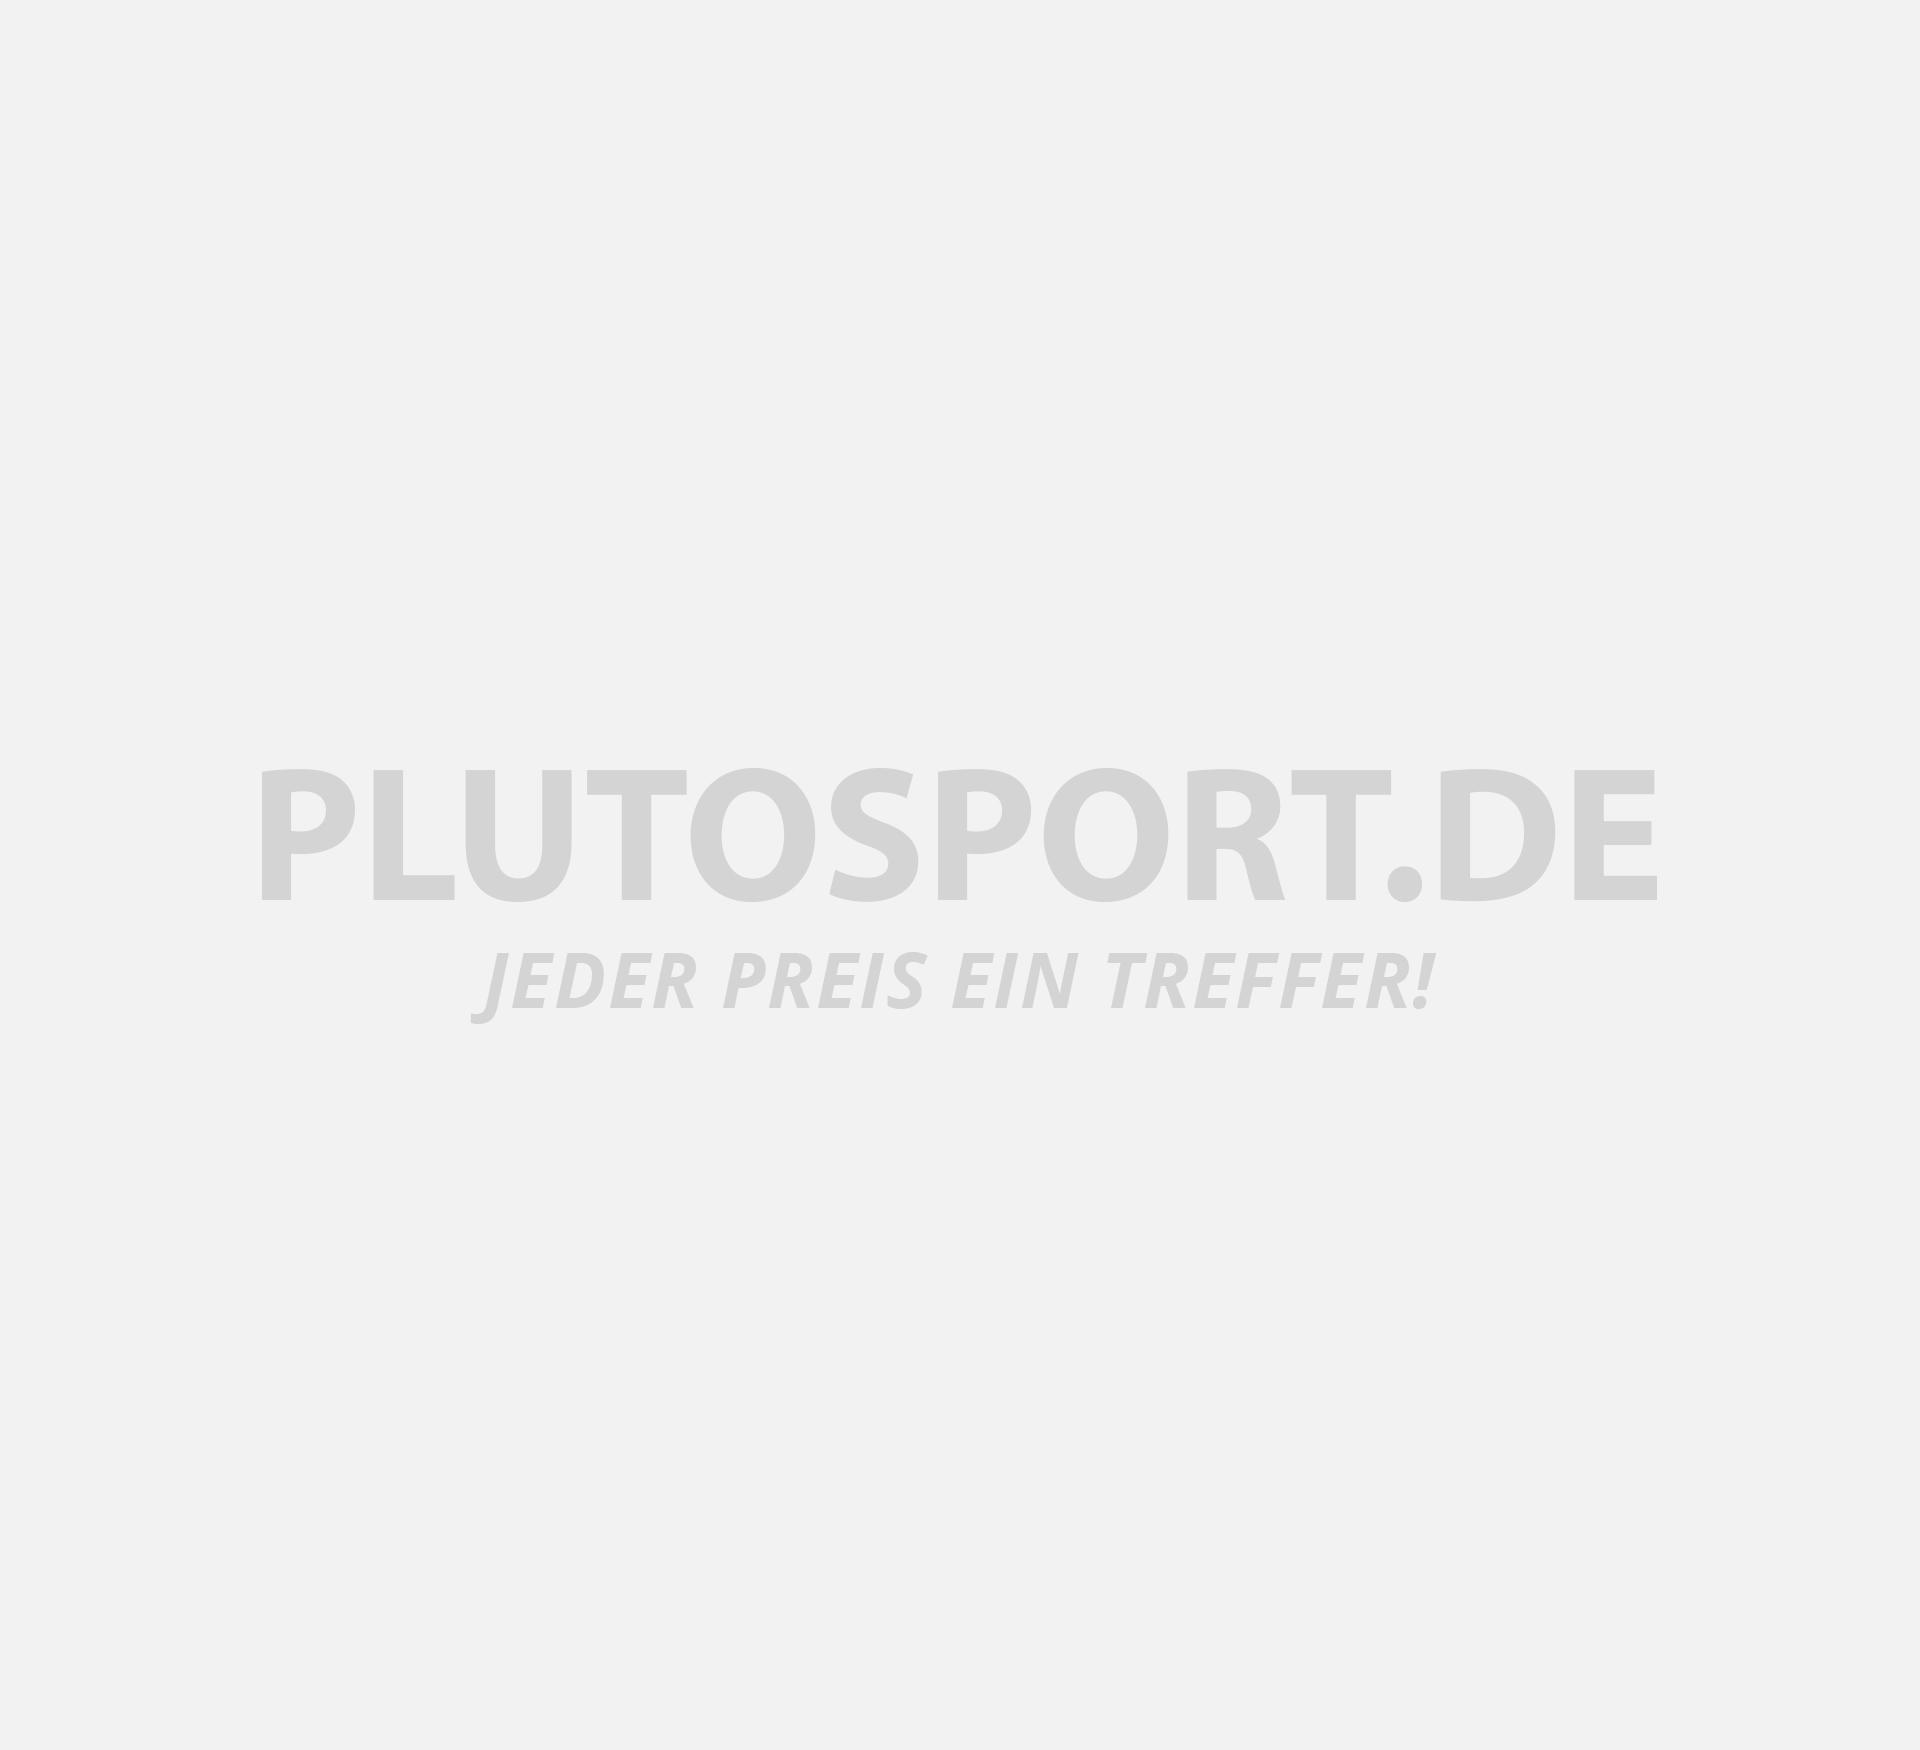 Skechers Twi-Lites 2.0 - Neon Muse Sneakers Mädchen